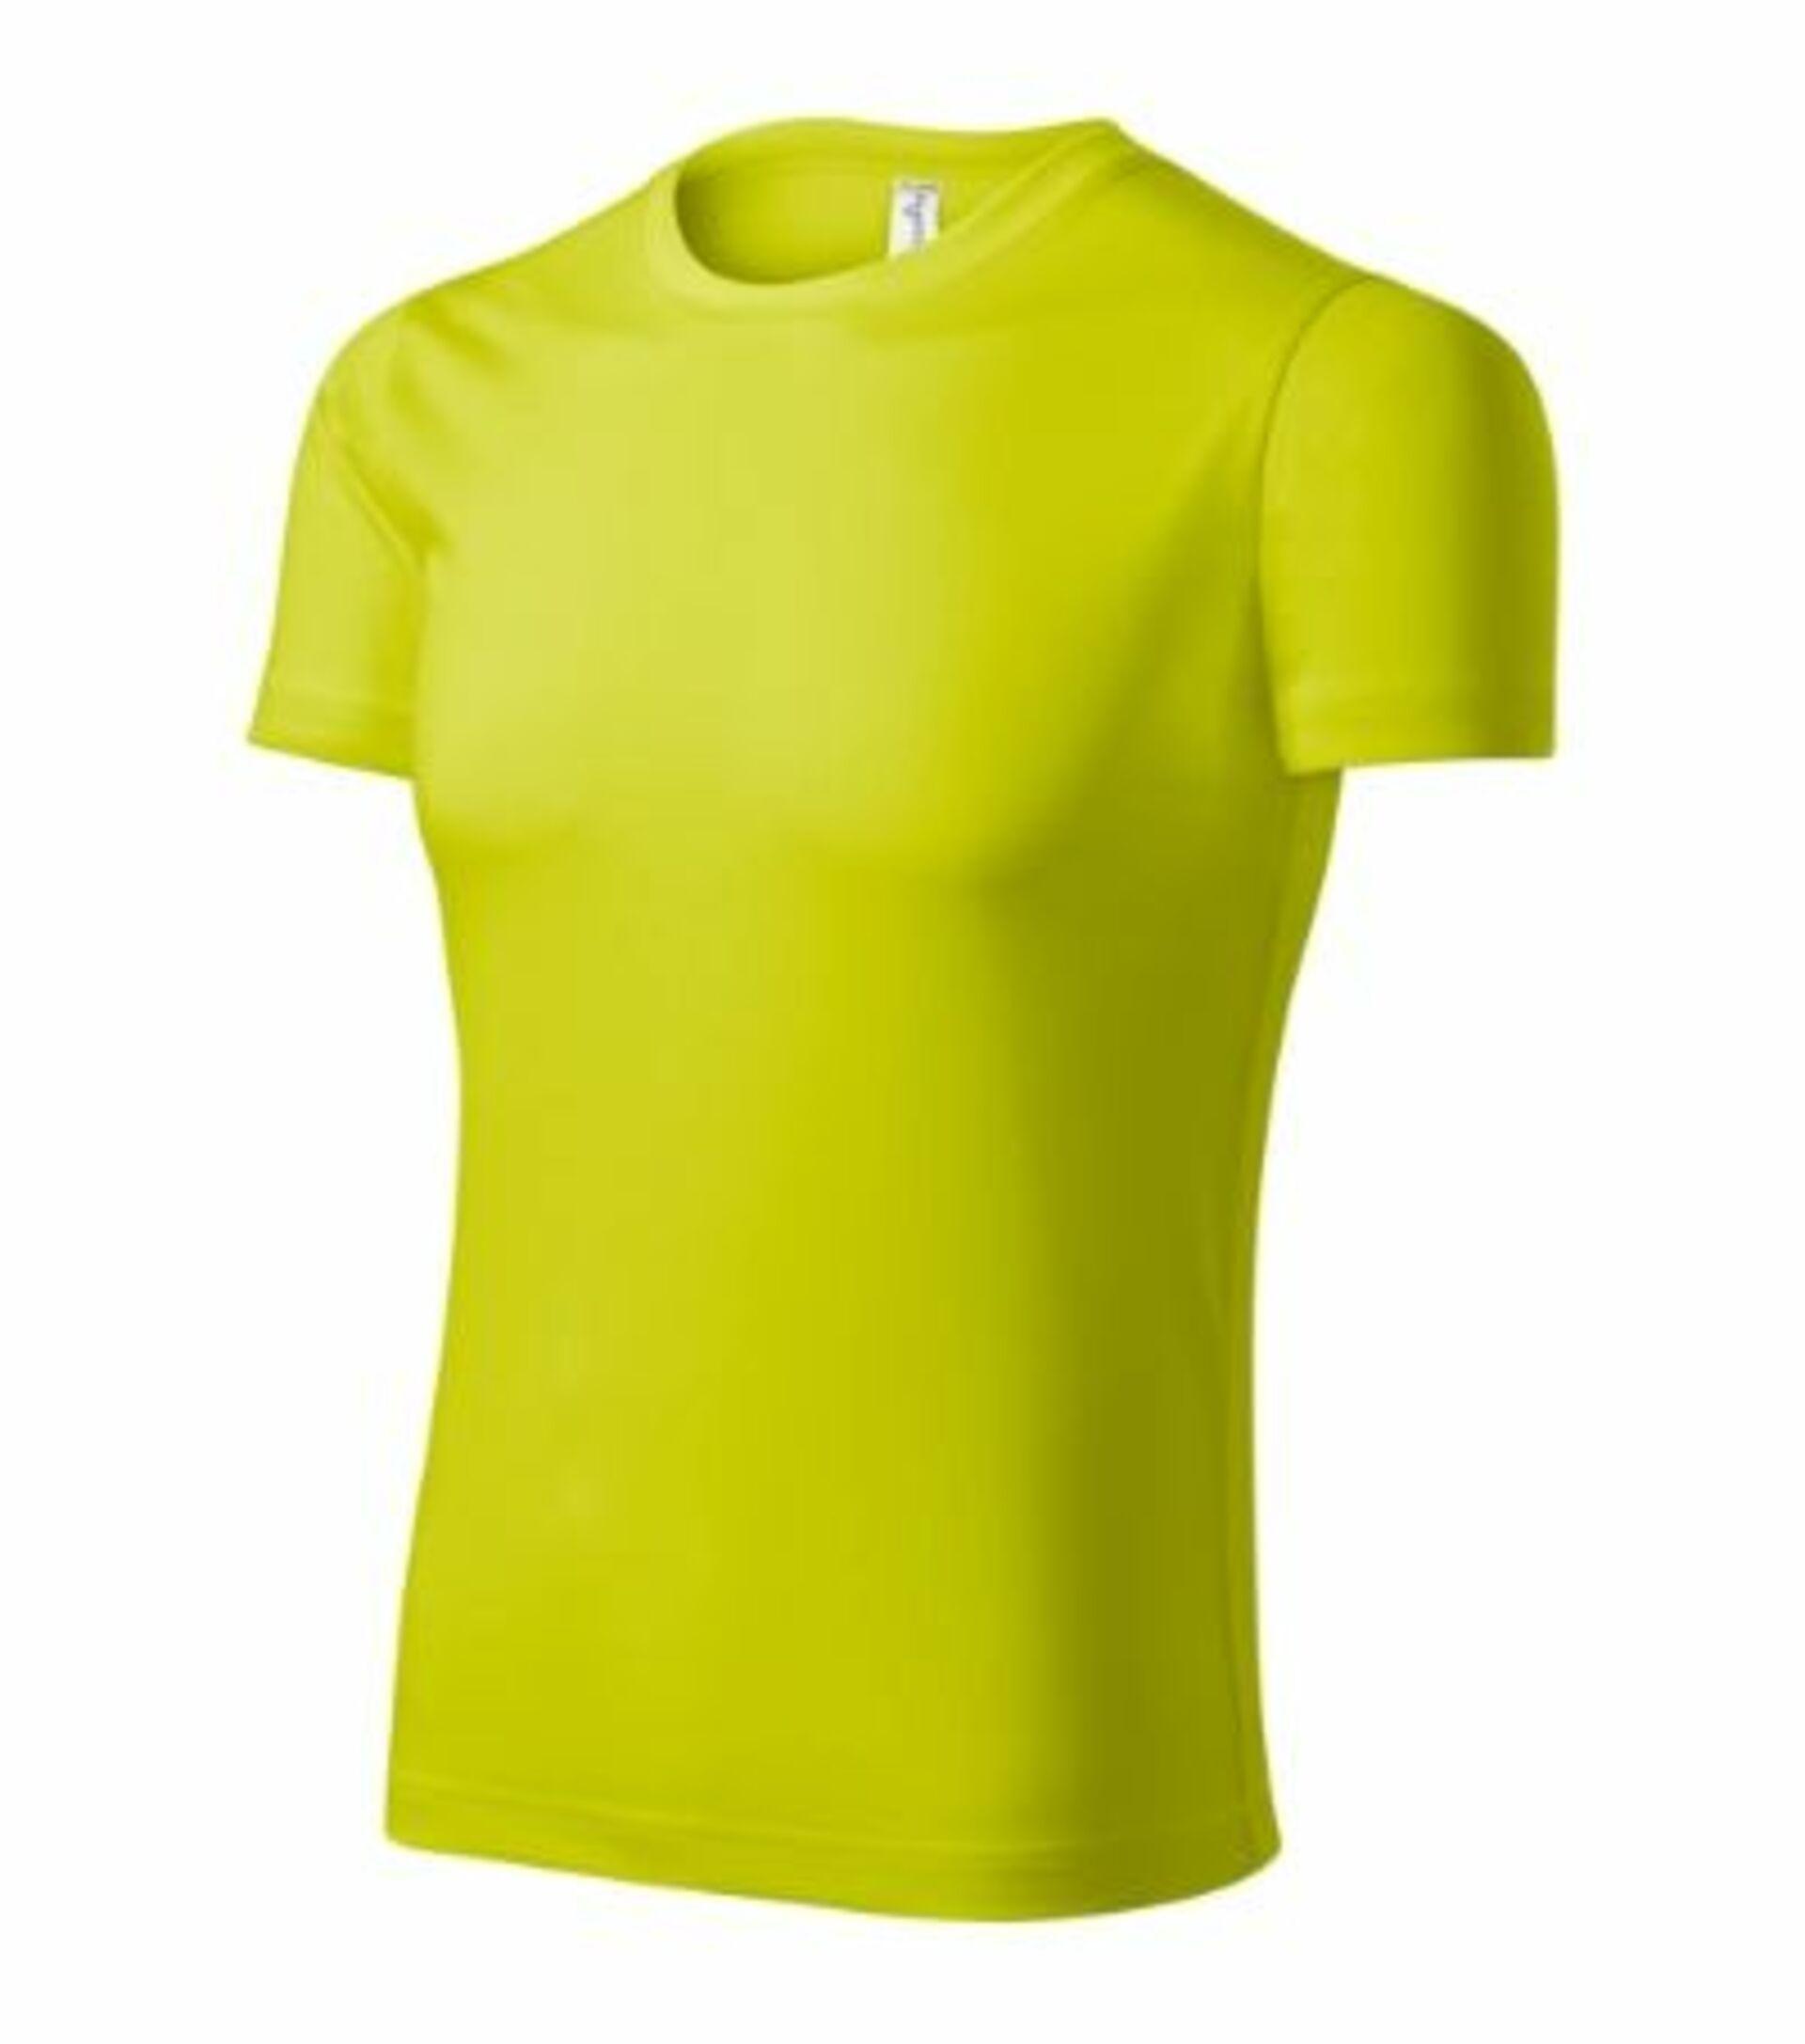 Malfini ADLER PIXEL P81 Tričko žlutá L